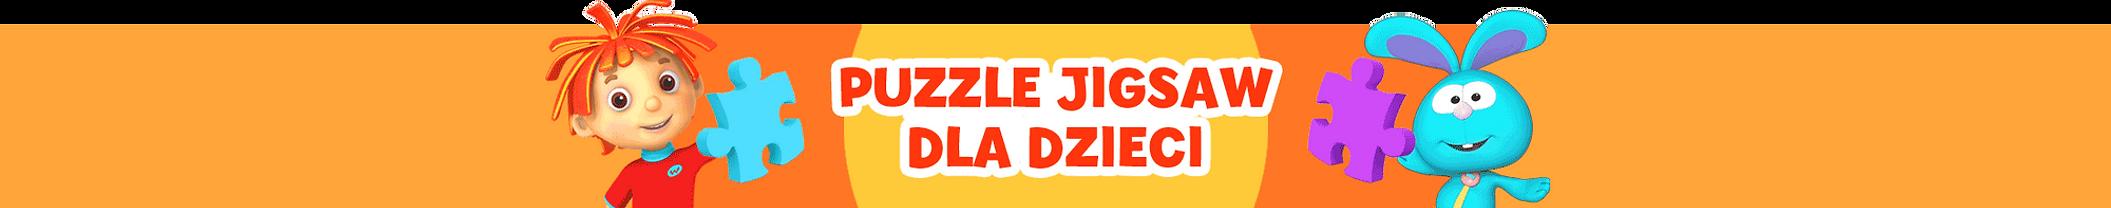 Polish - Jigsaw---Sub-Section-Banner.png